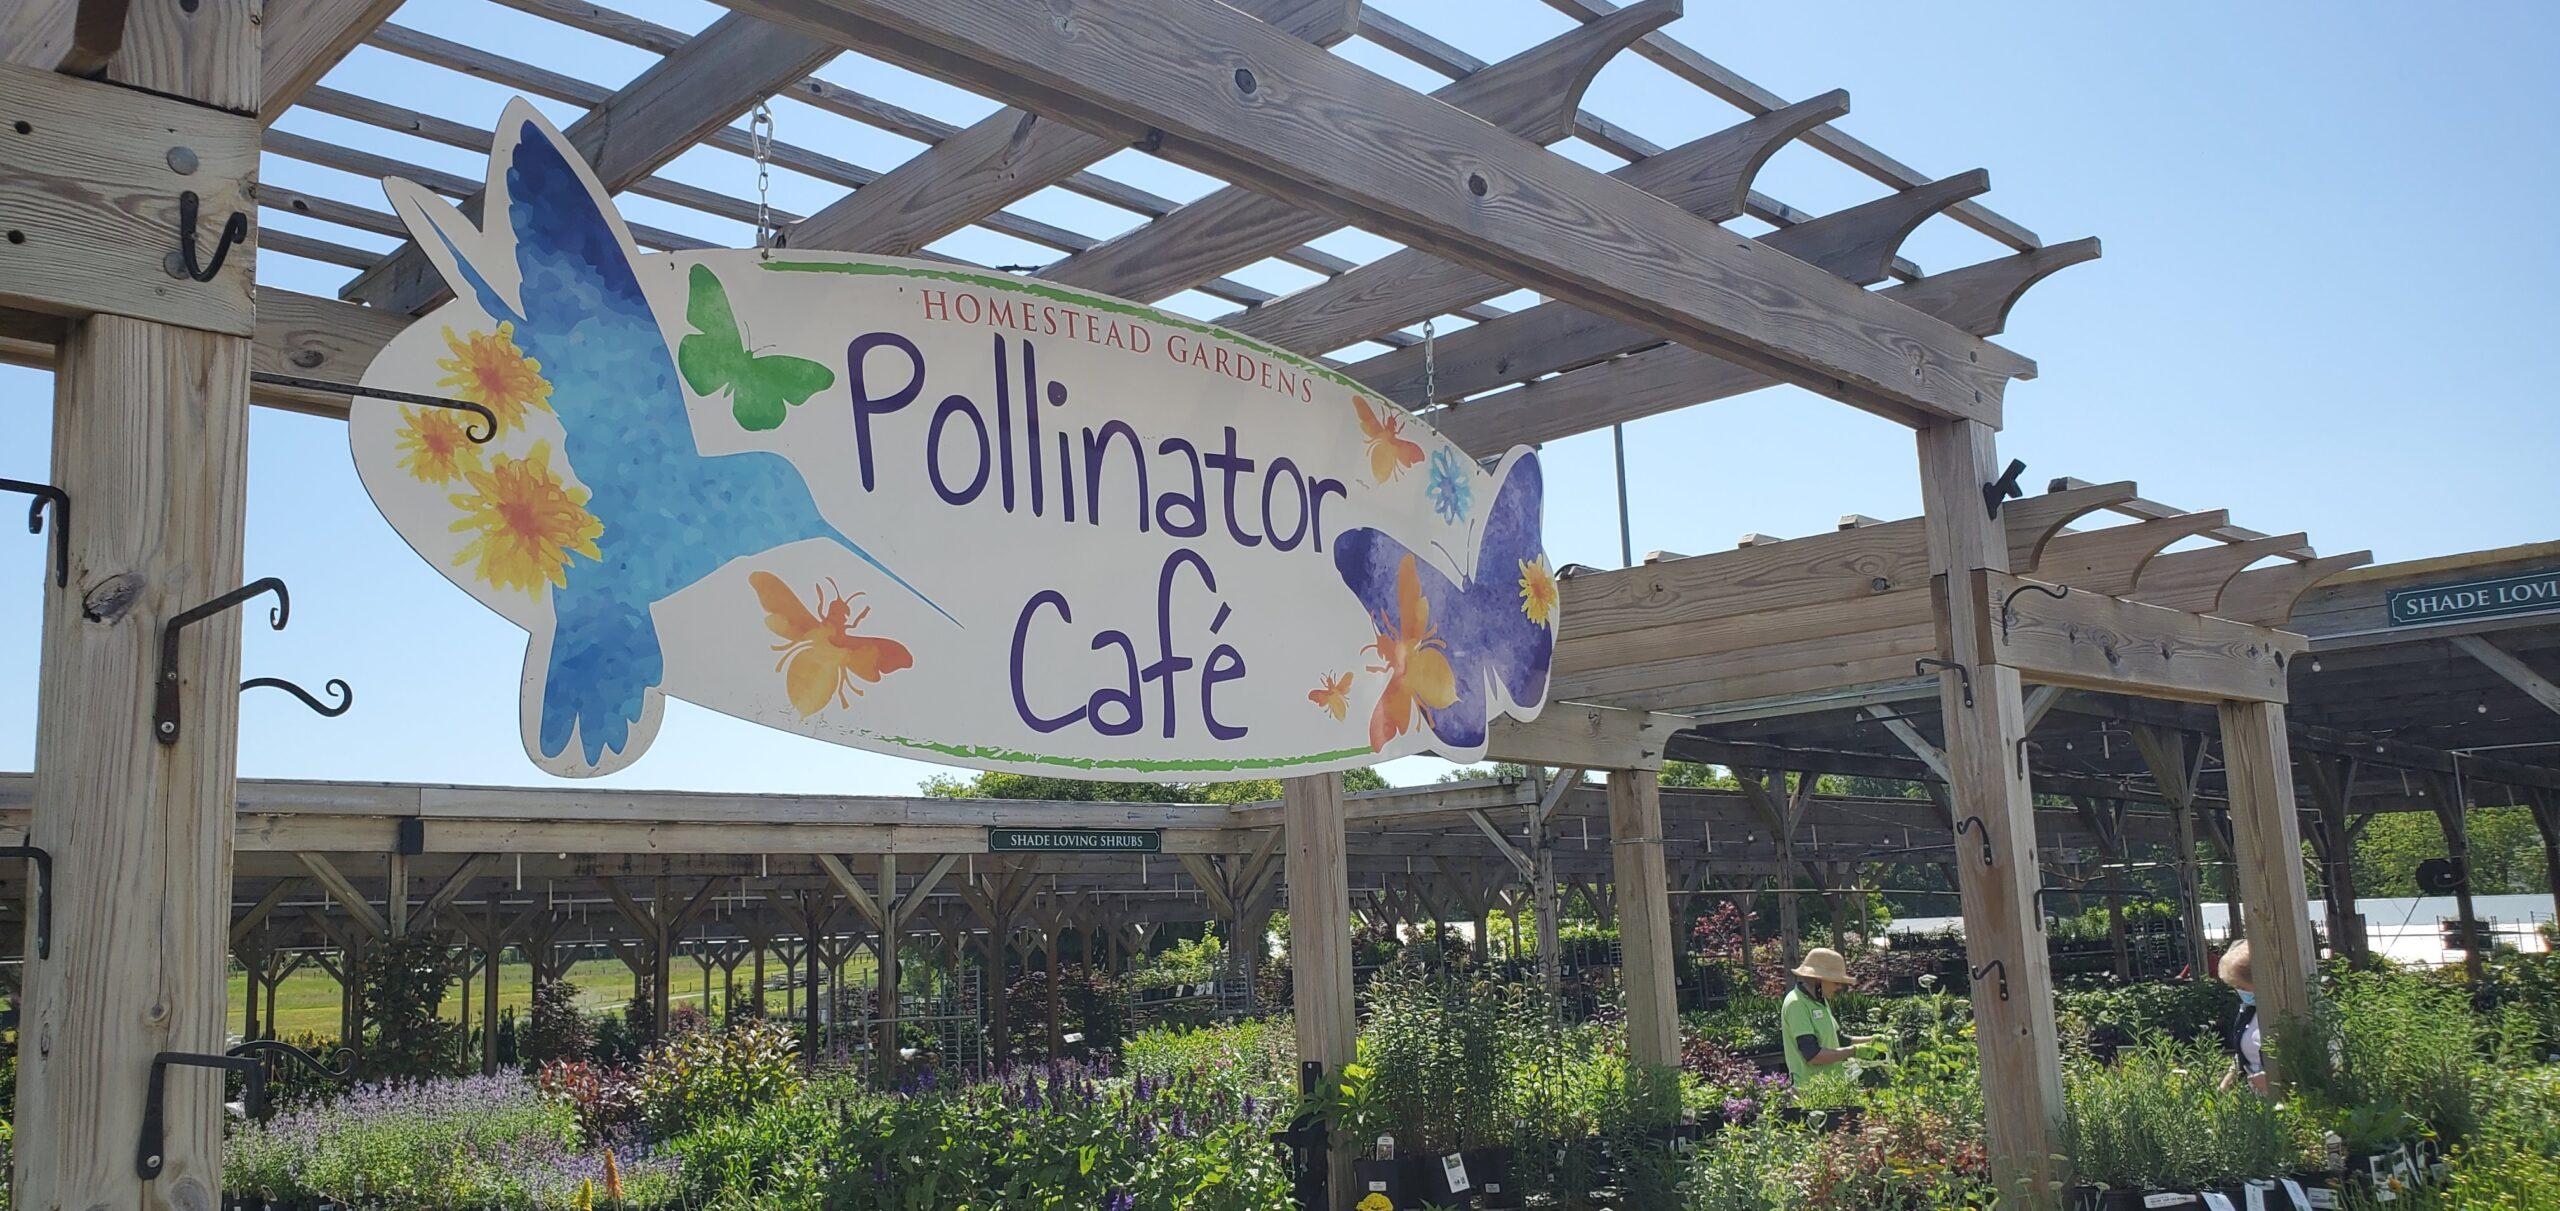 Homestead Gardens Pollinator Cafe